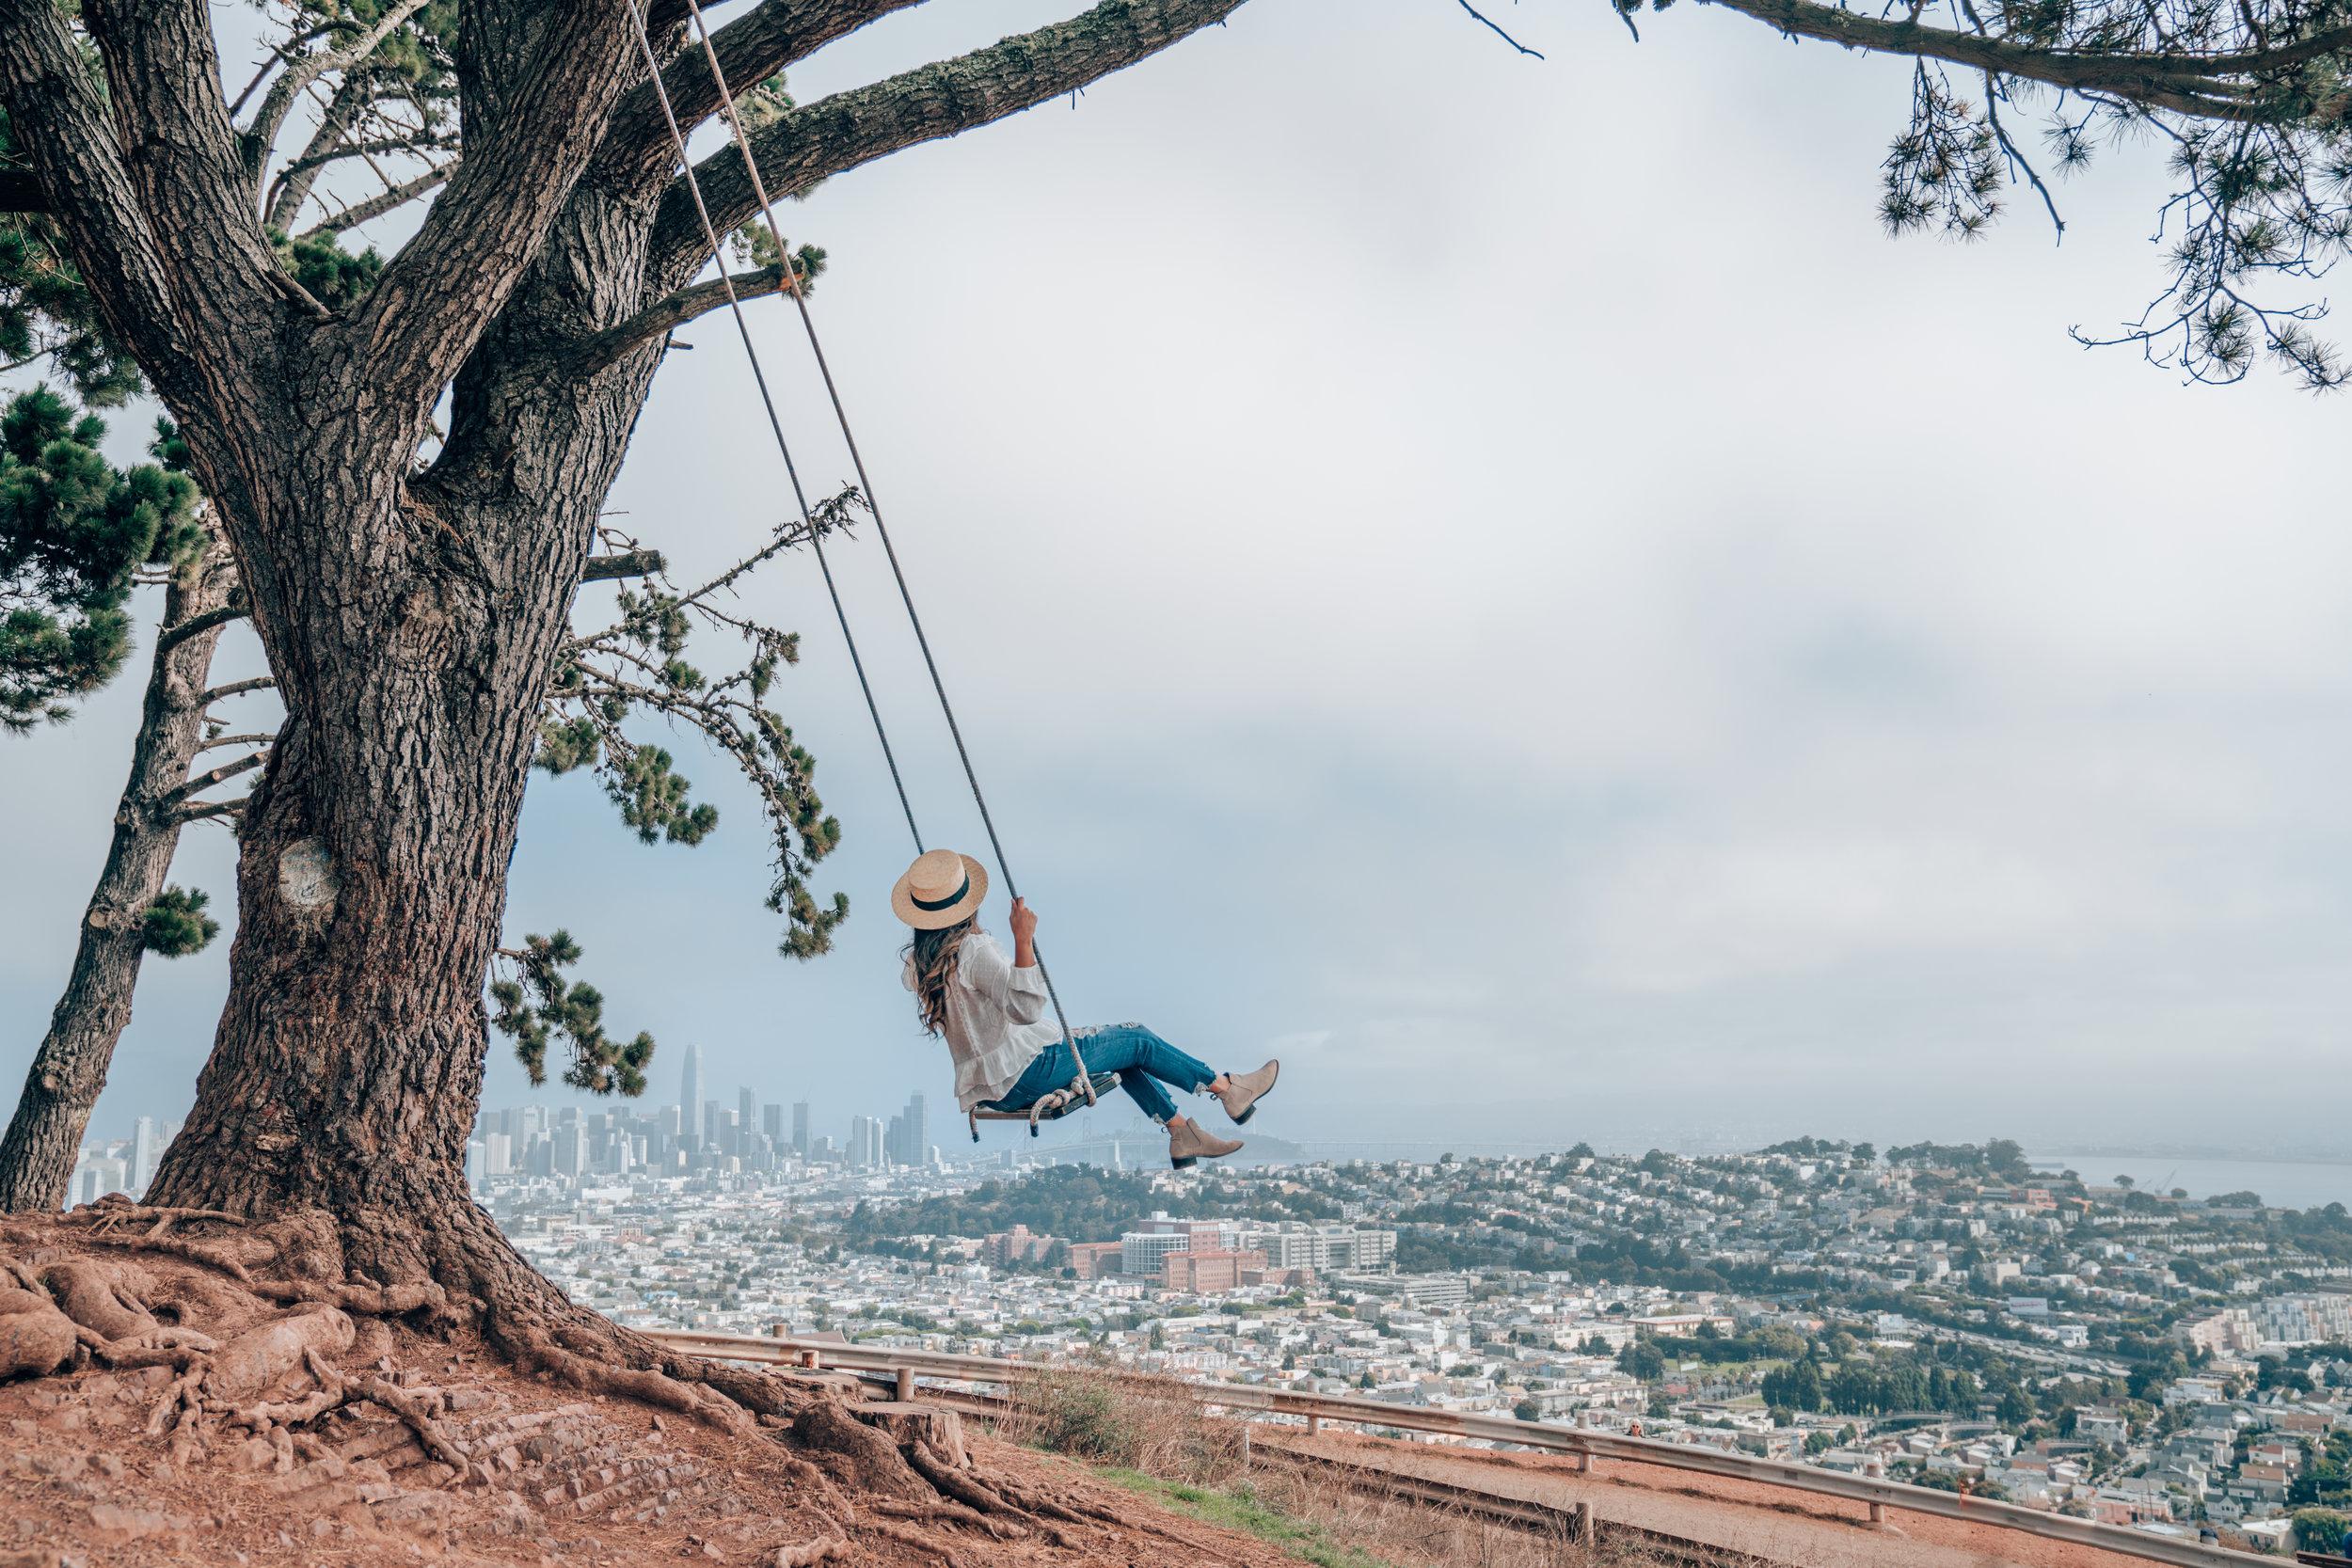 Bernal Heights Swing at Bernal Heights Park, San Francisco, California